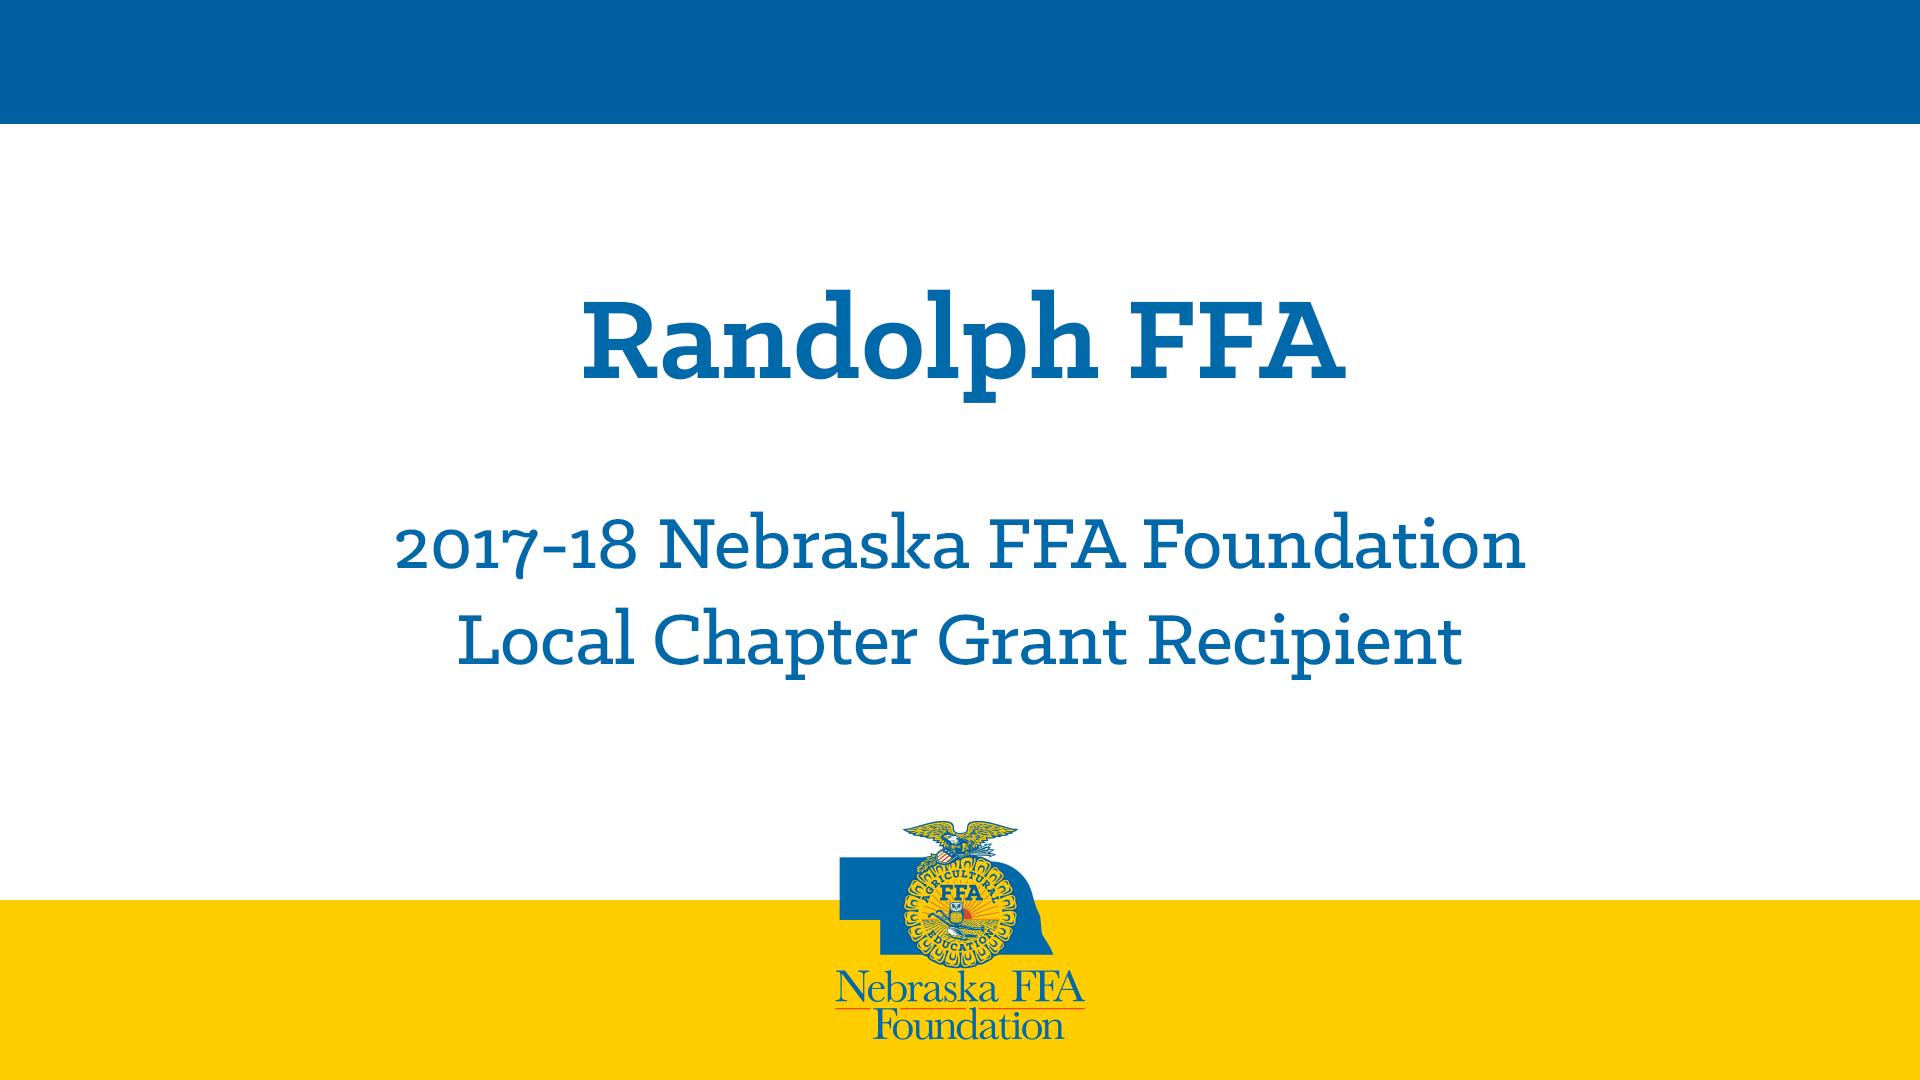 2017 Local Chapter Grant Recipient: Randolph